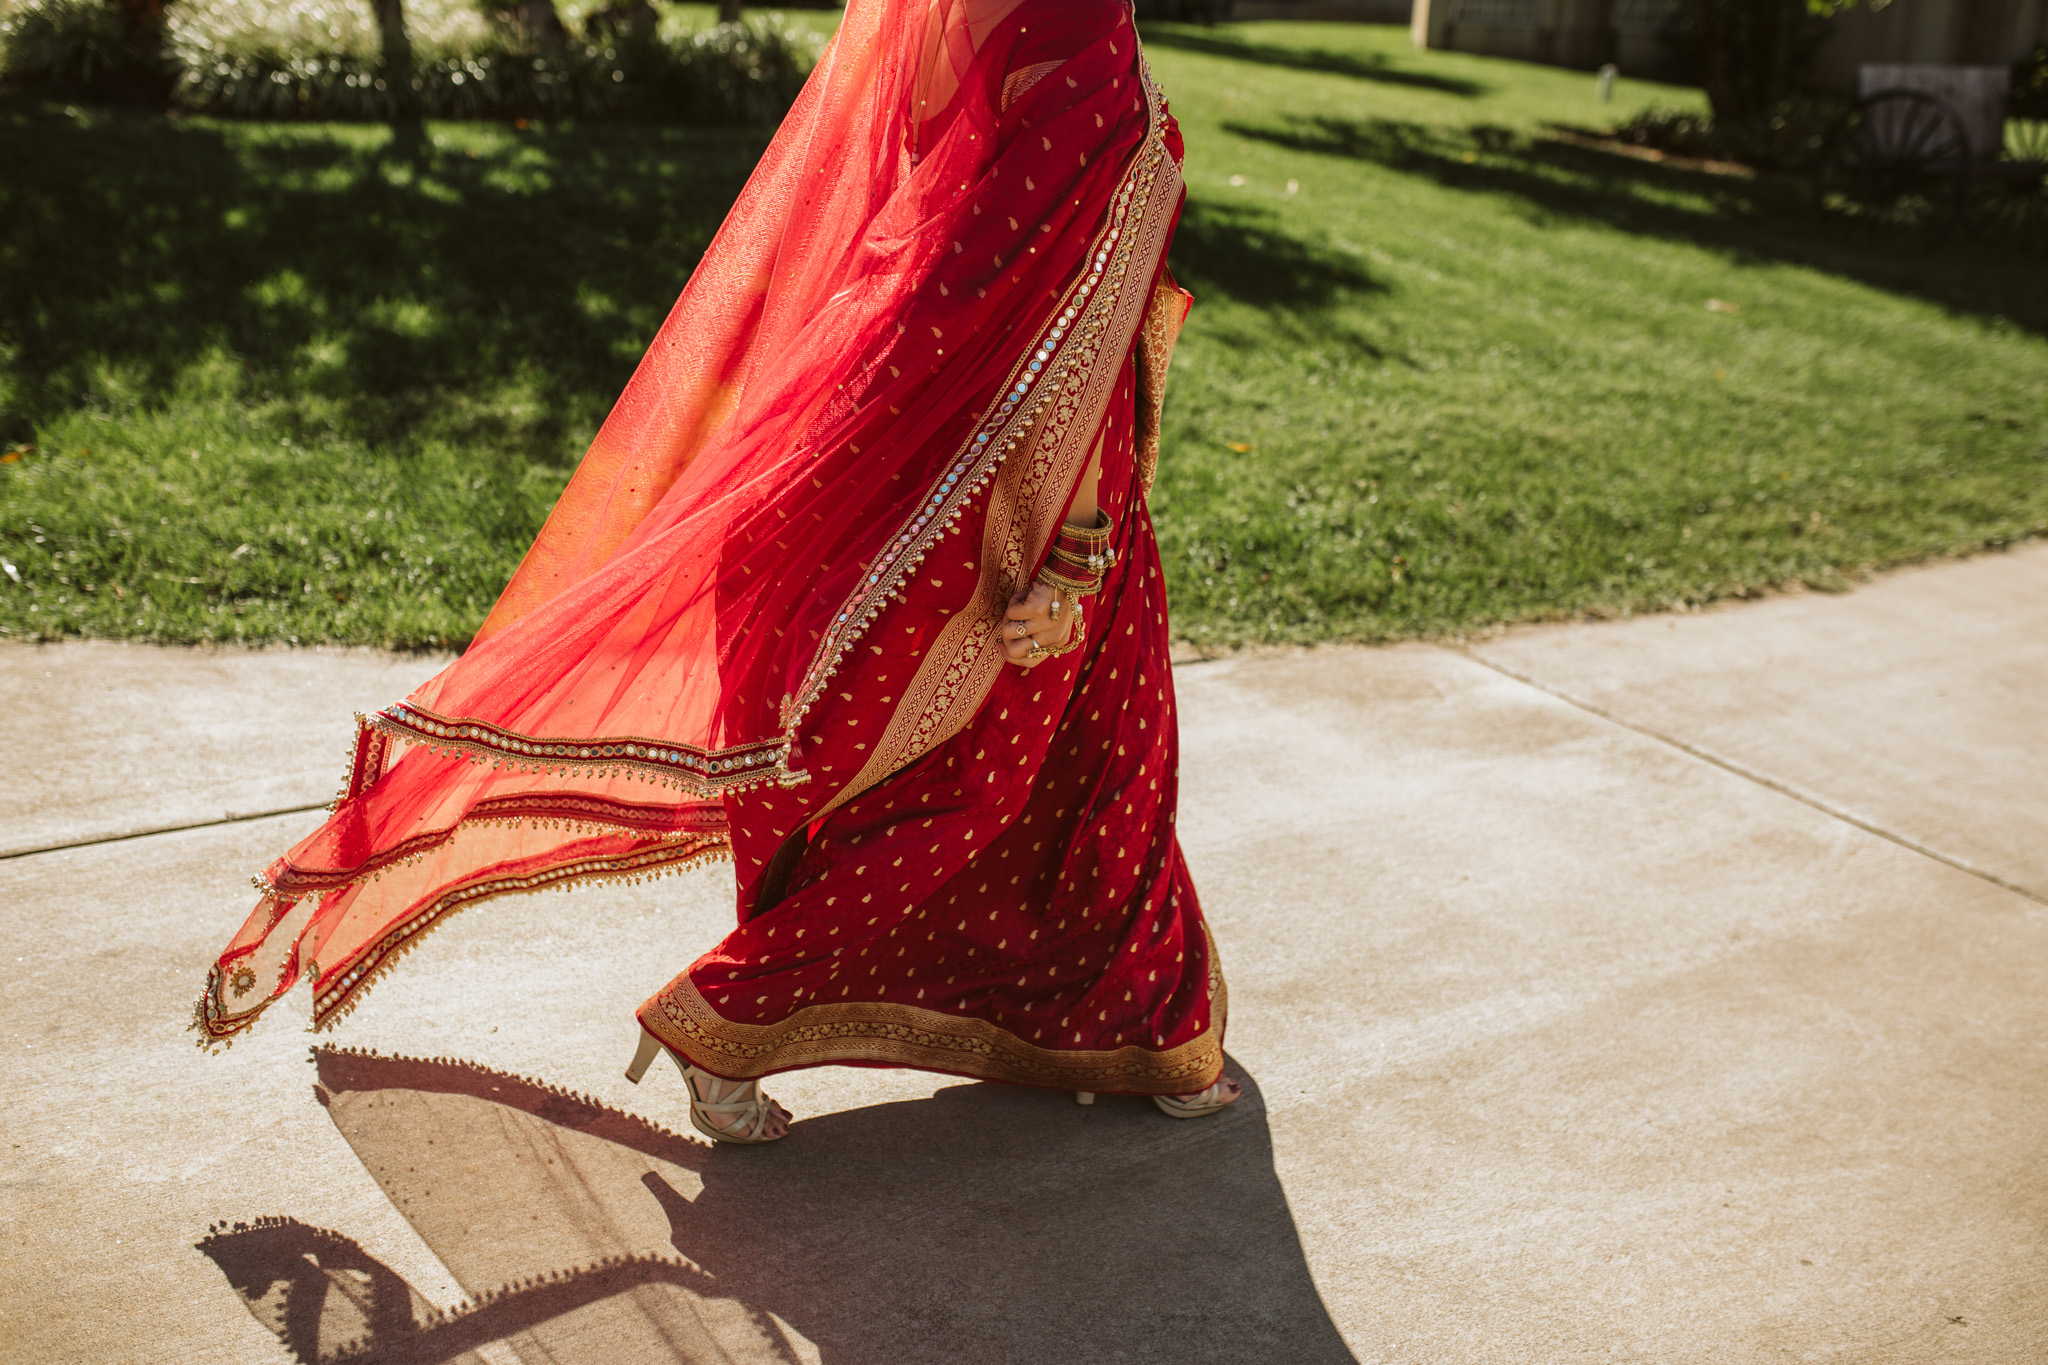 rebeccaburtphotography.hindiwedding.moraisvineyards.virginiawedding-119.JPG